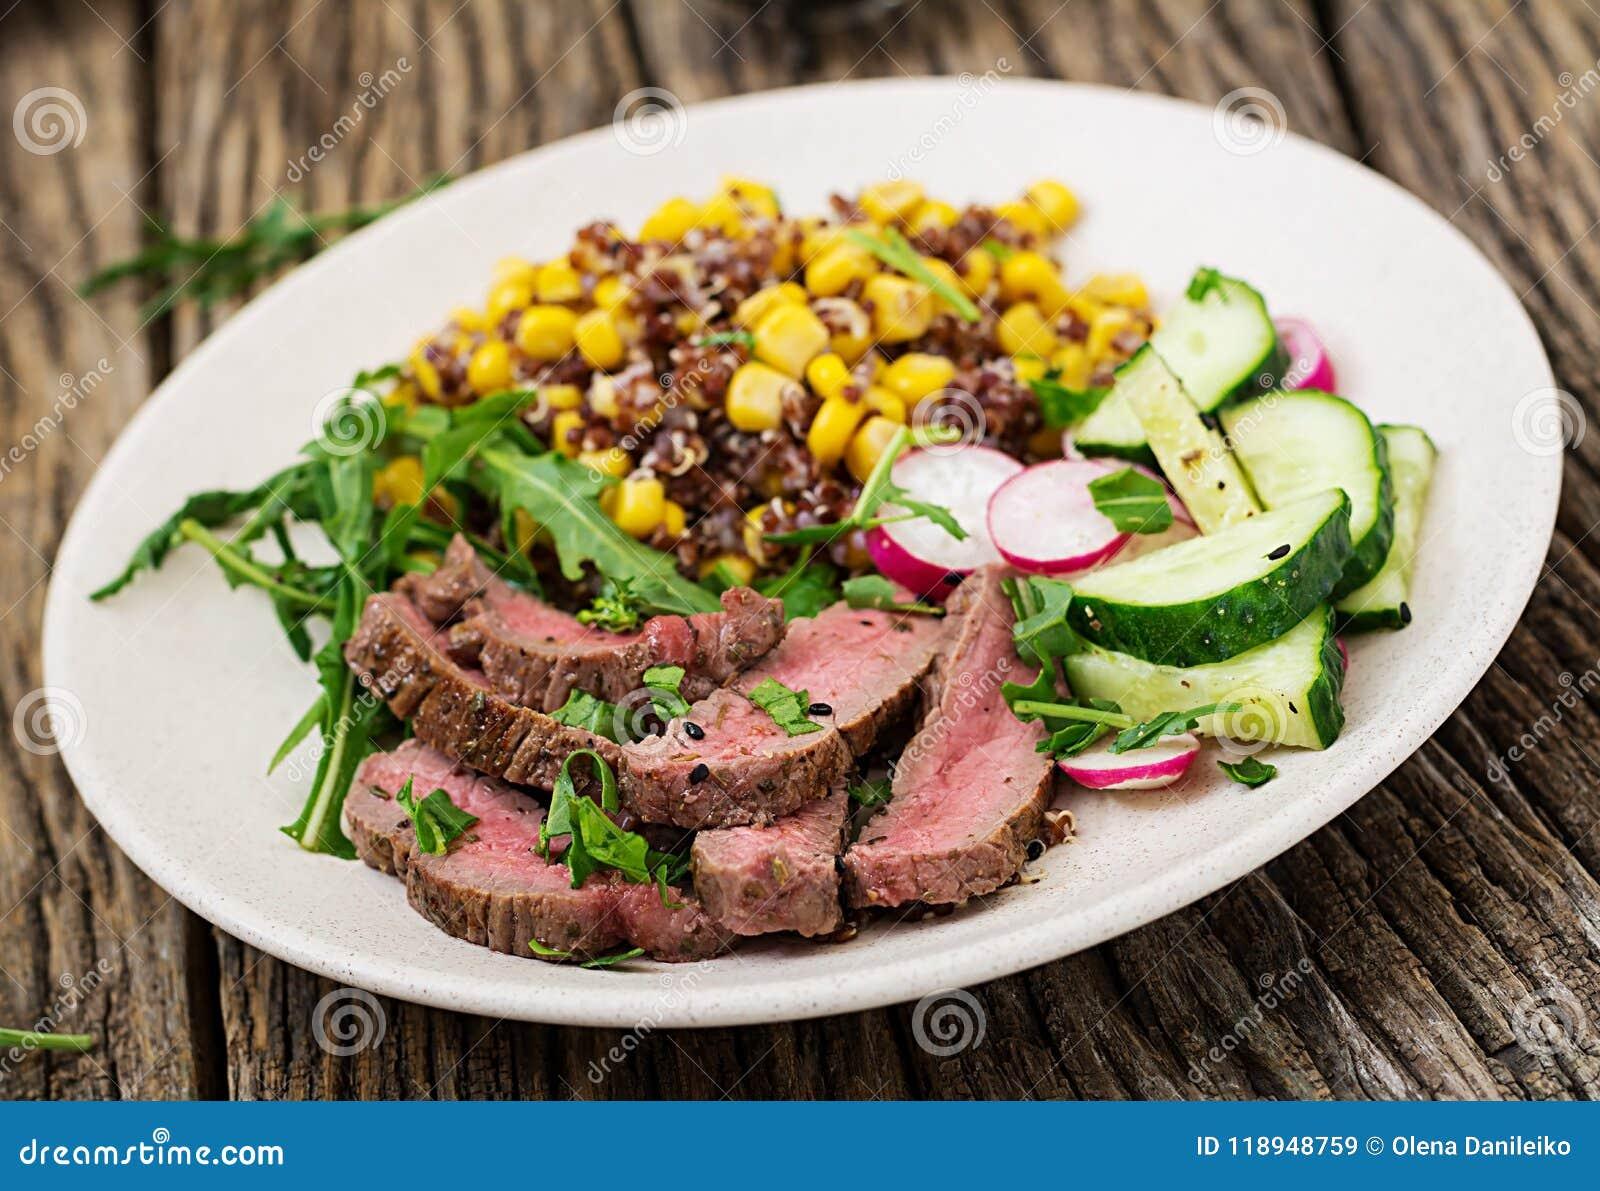 Komlunch met geroosterde rundvleeslapje vlees en quinoa, graan, komkommer, radijs en arugula